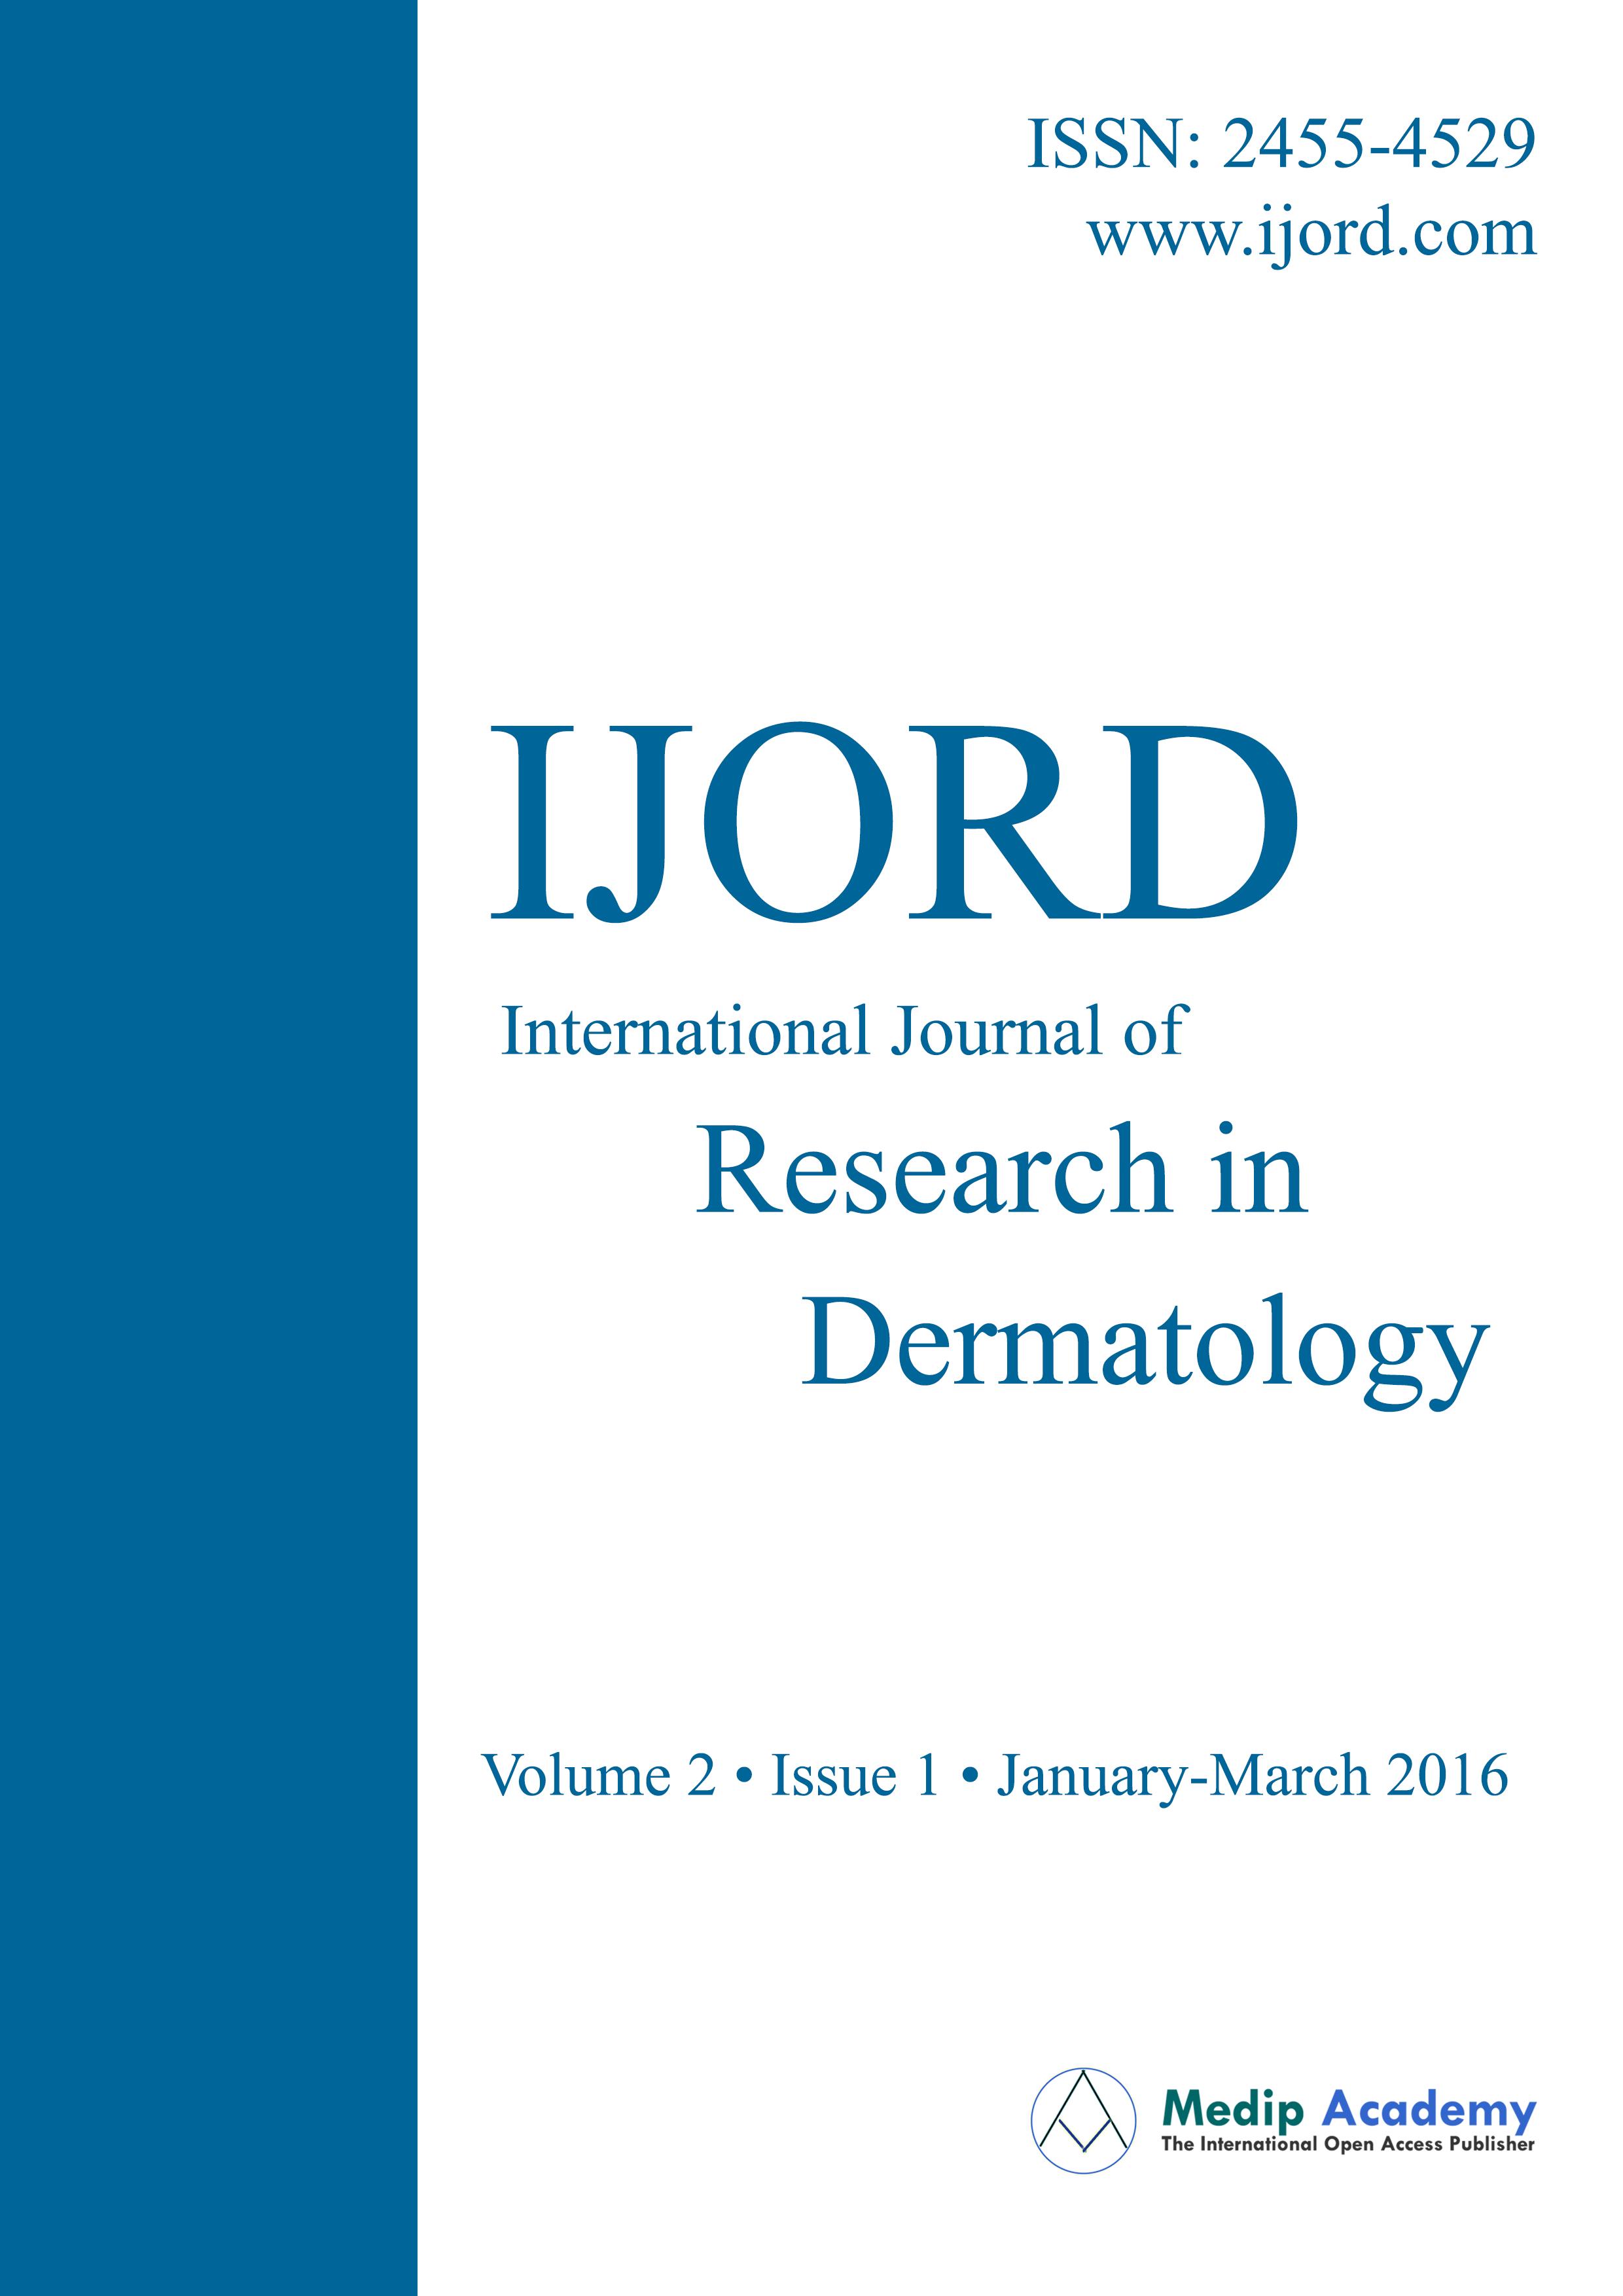 International Journal of Research in Dermatology